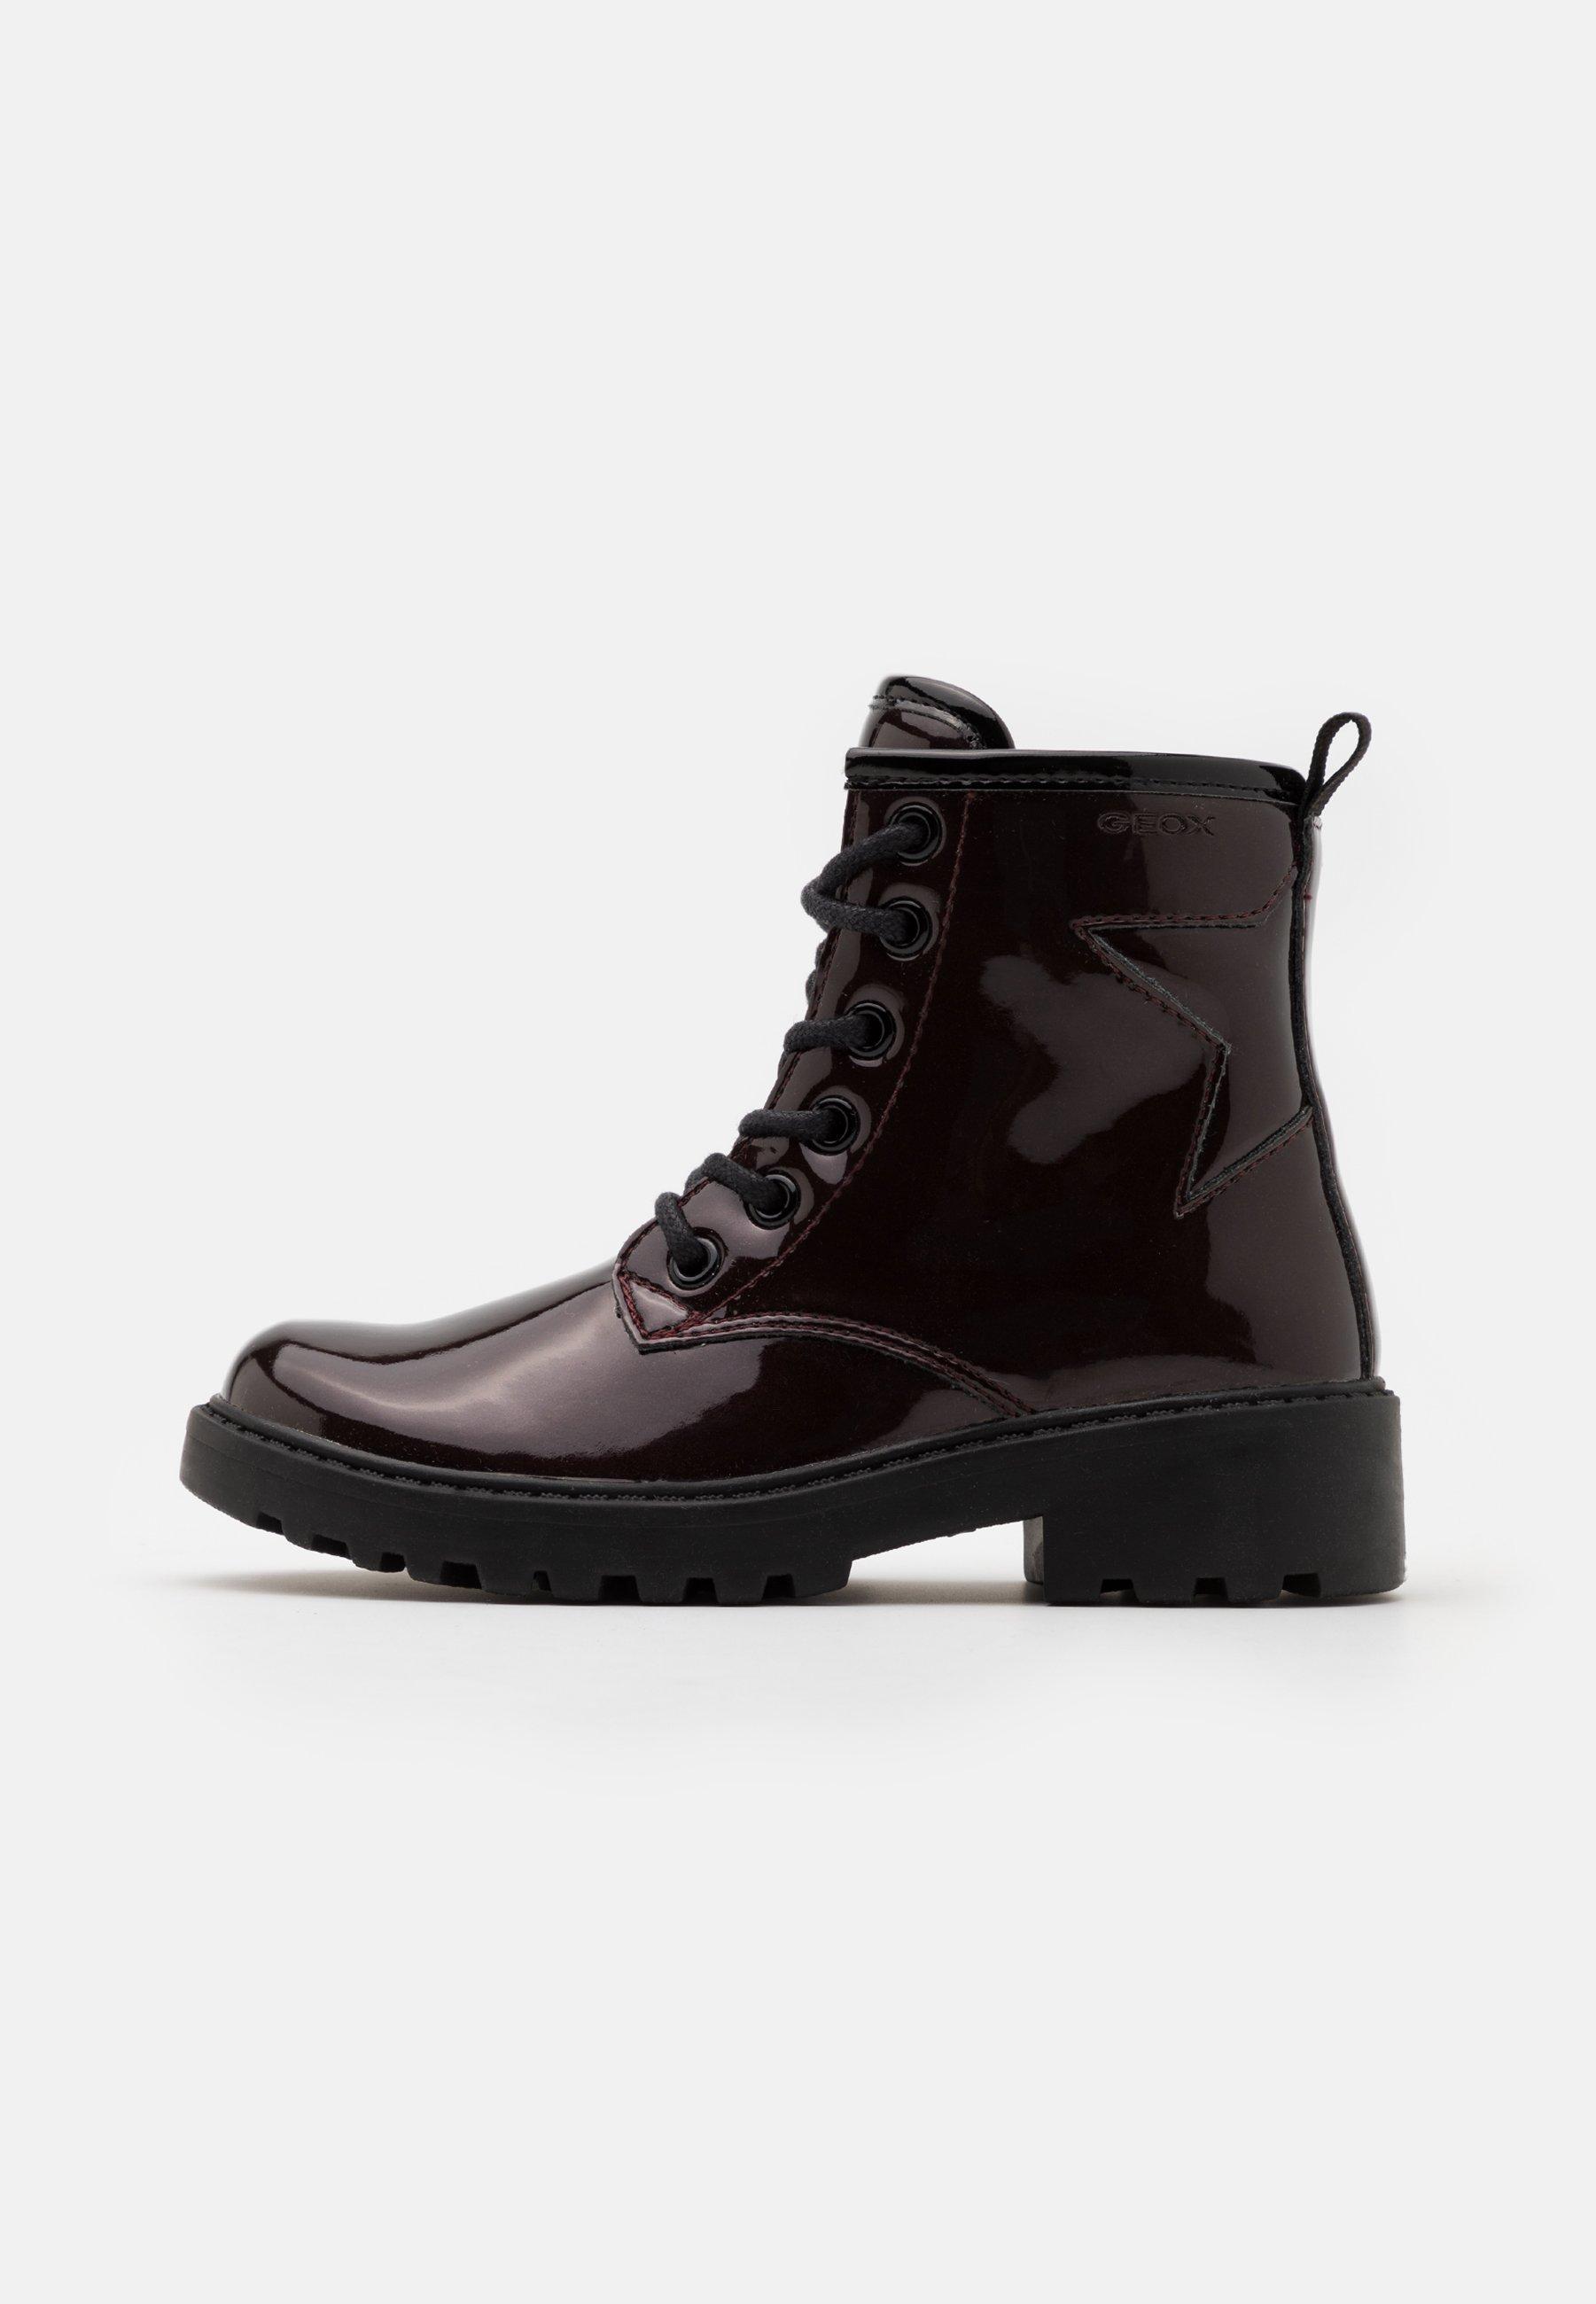 crucero reducir Aceptado  Geox CASEY GIRL - Lace-up ankle boots - dark burgundy - Zalando.de